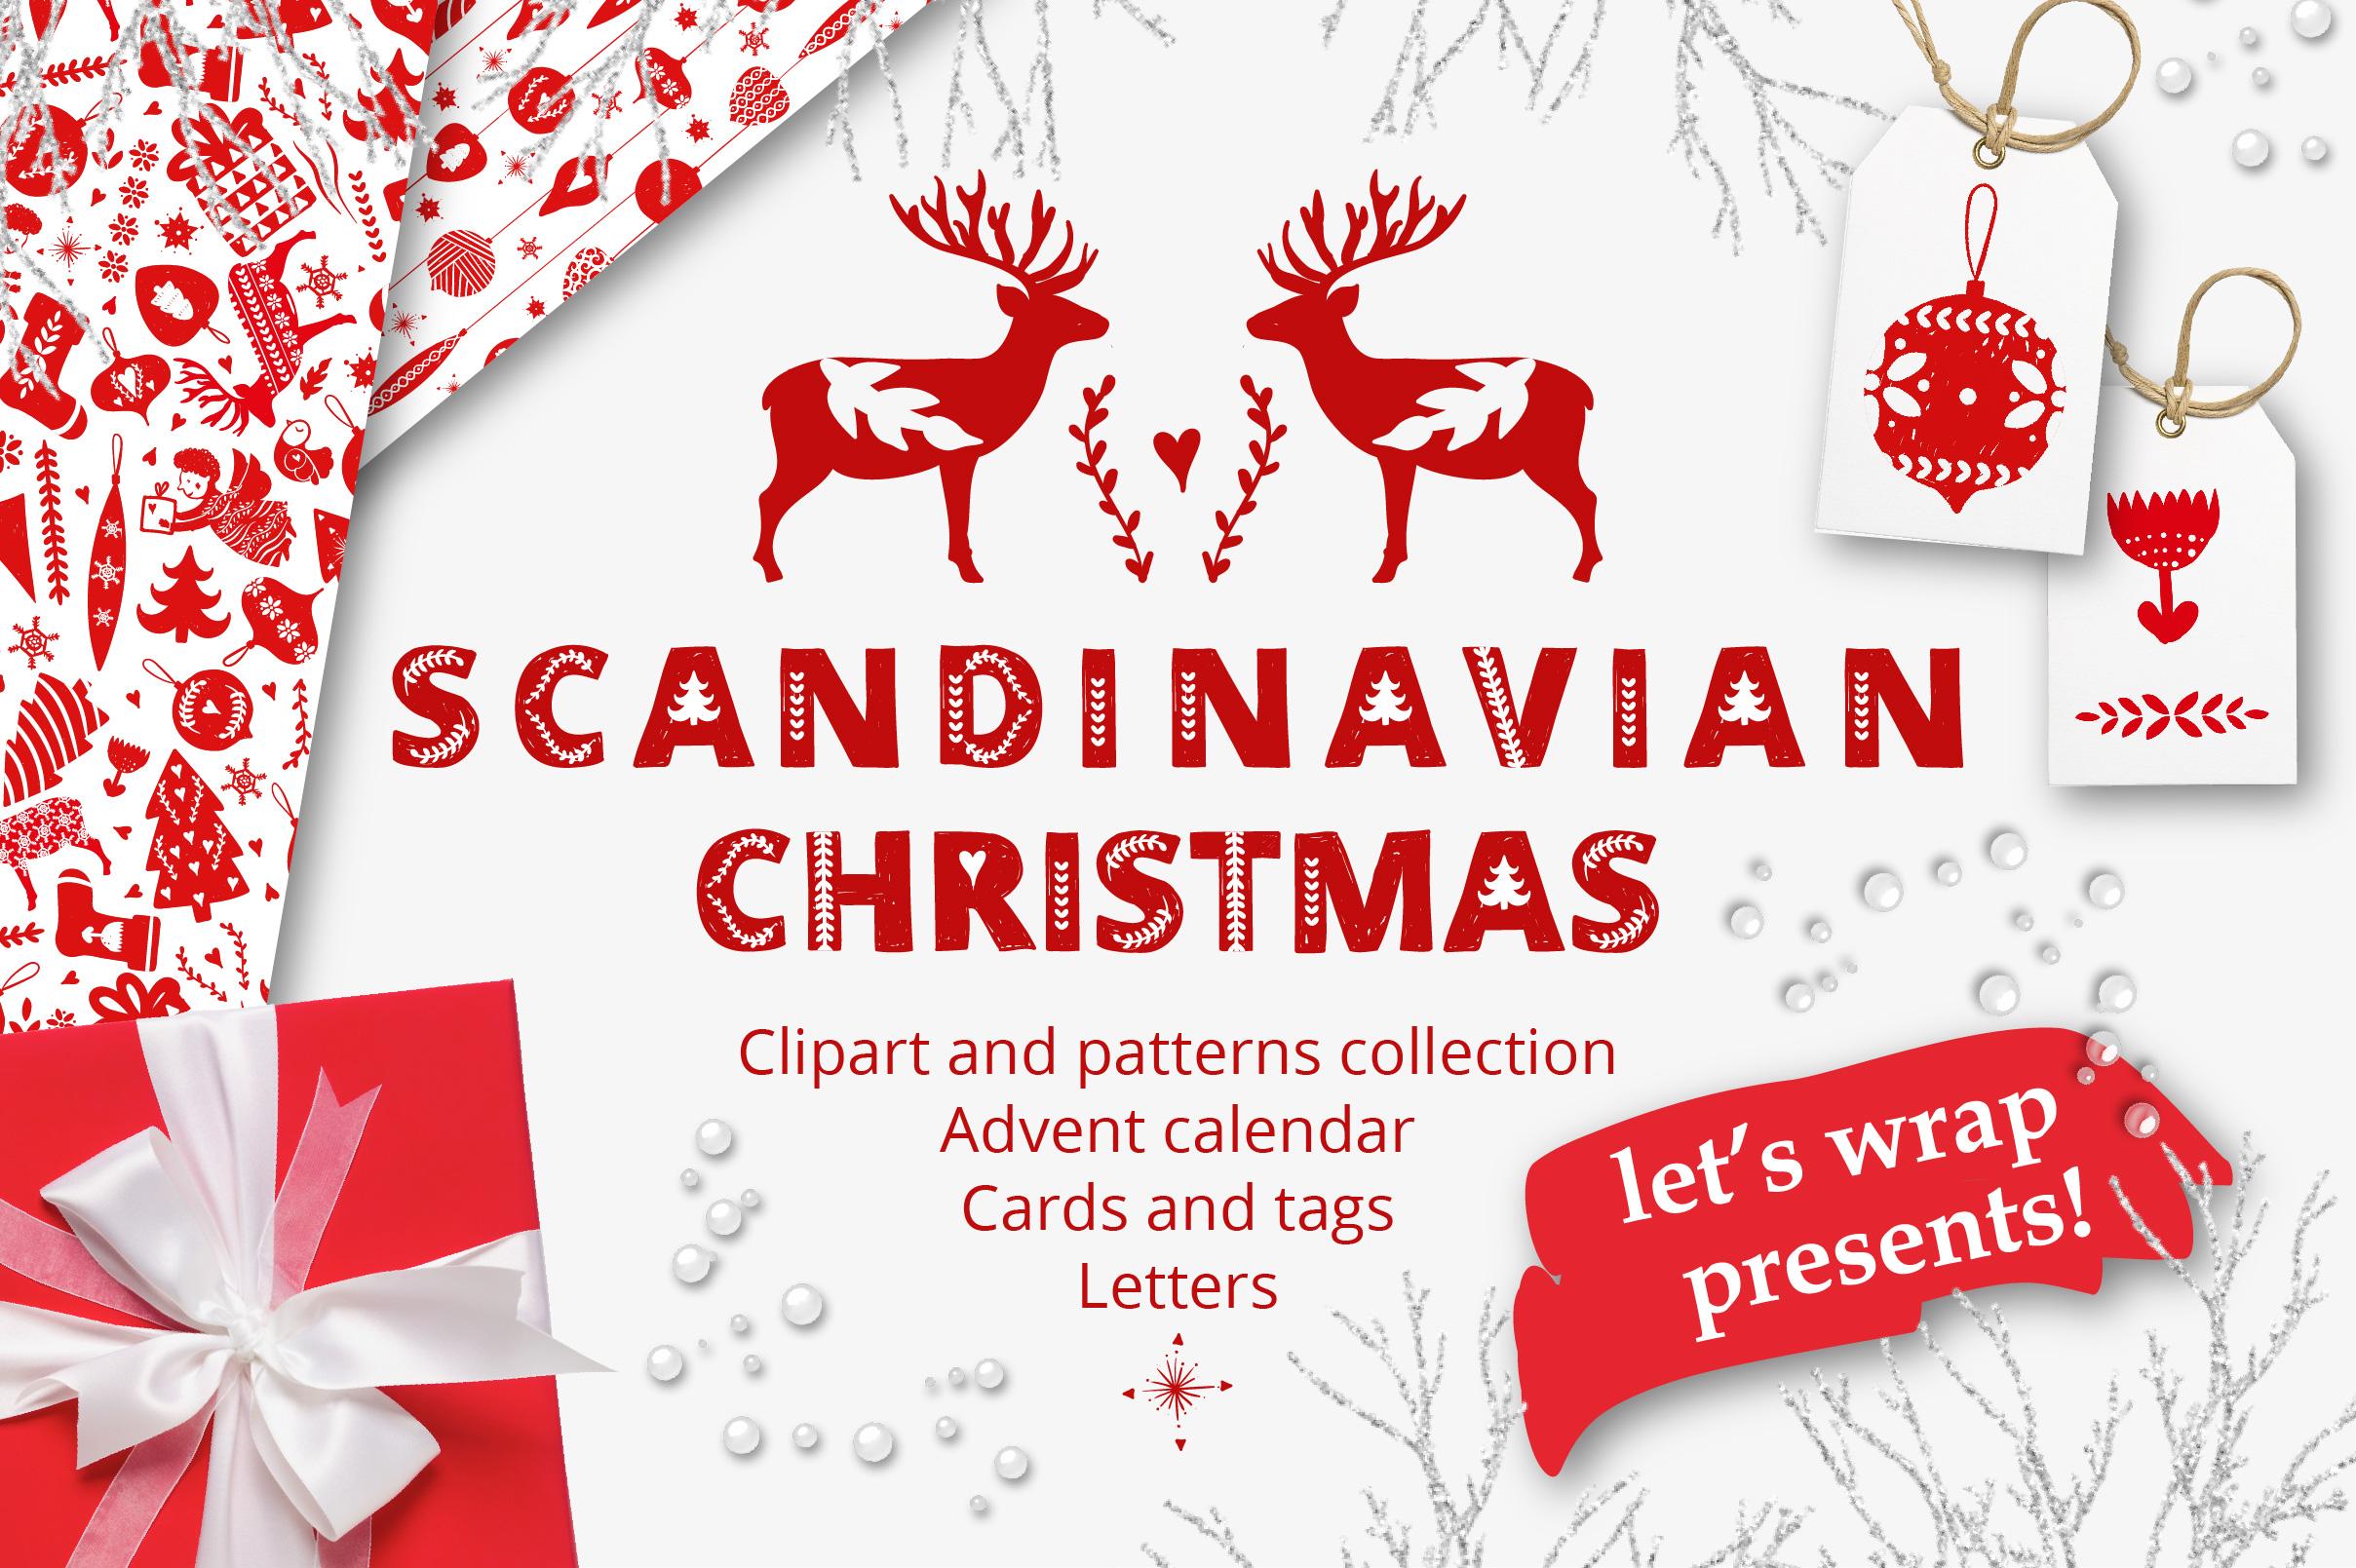 Scandinavian christmas clipart royalty free library Scandinavian Christmas in Red royalty free library